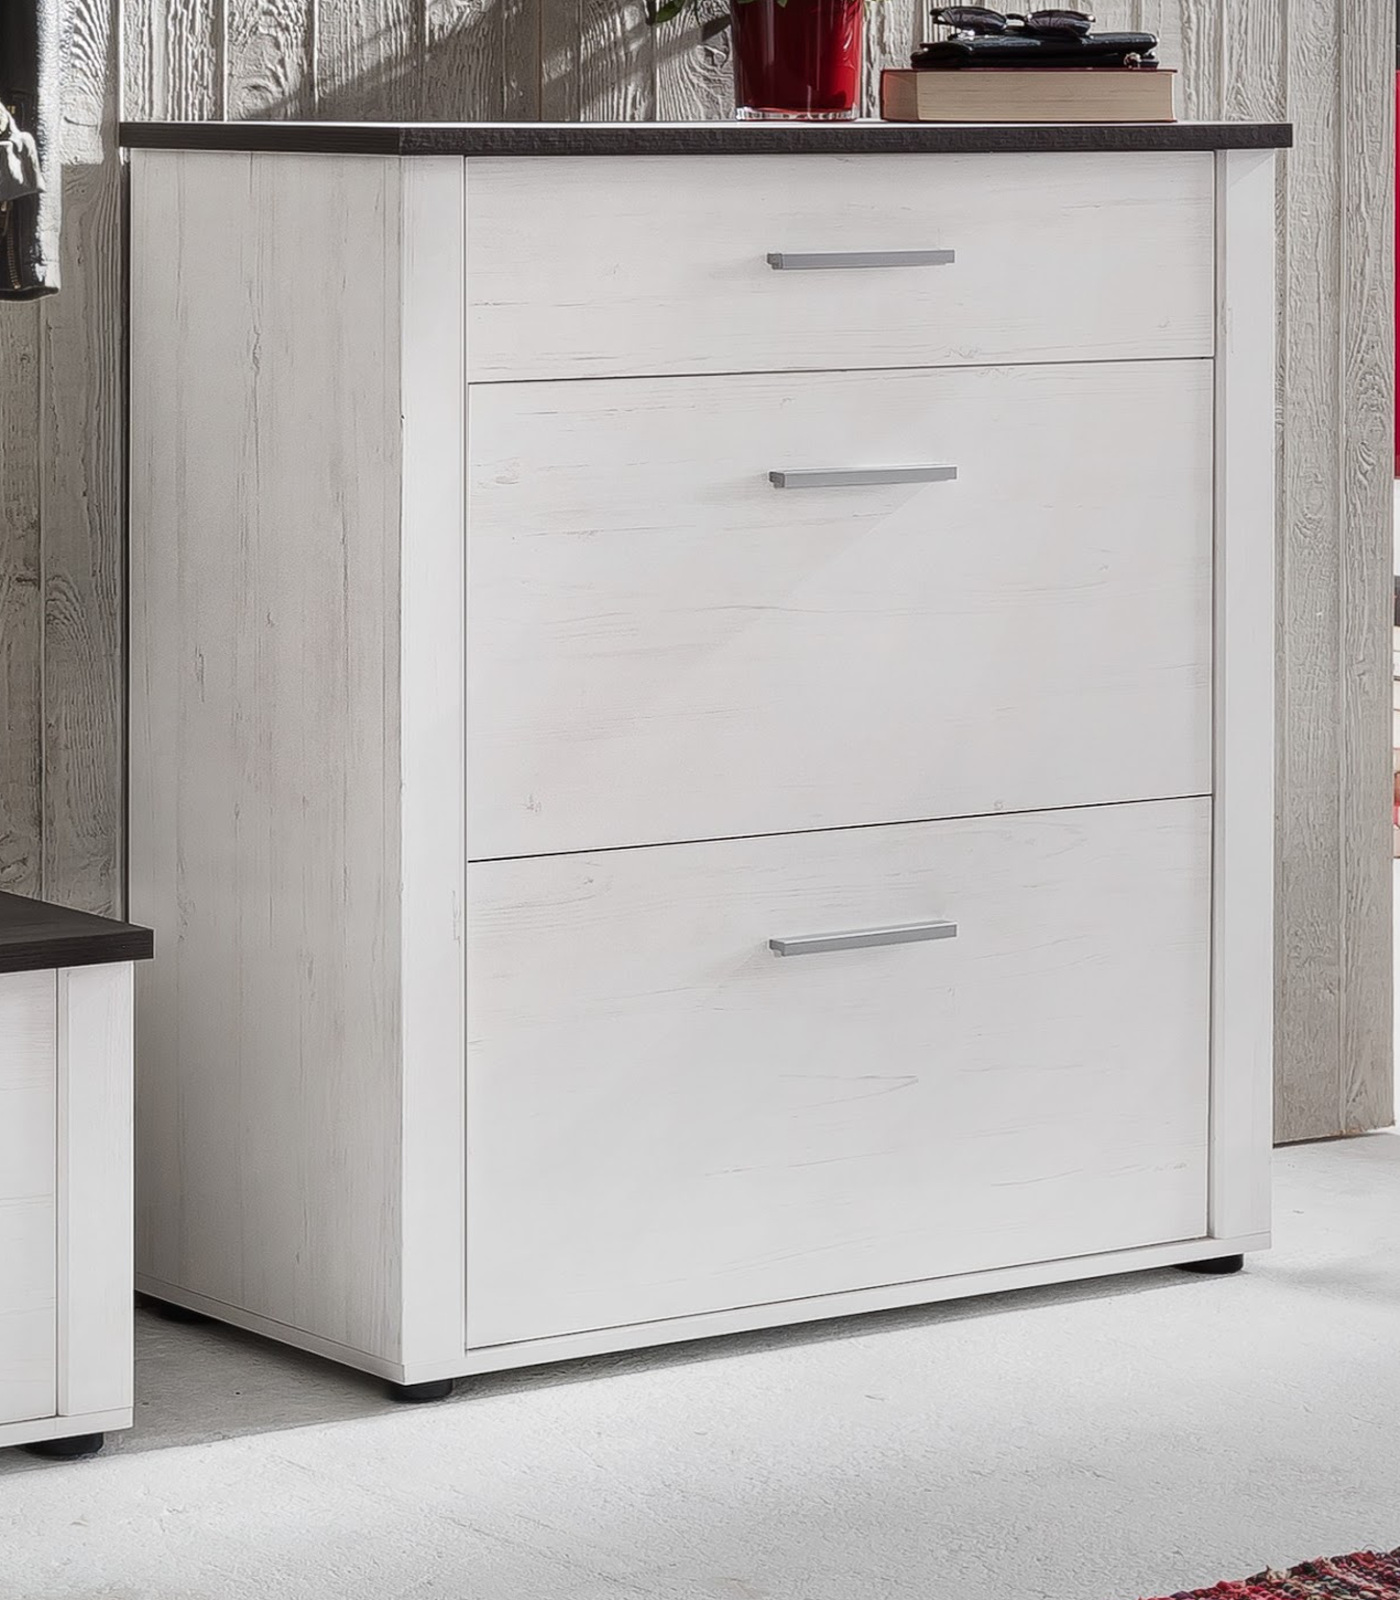 schlafzimmer massivholz schrank bett erle massiv korsa. Black Bedroom Furniture Sets. Home Design Ideas